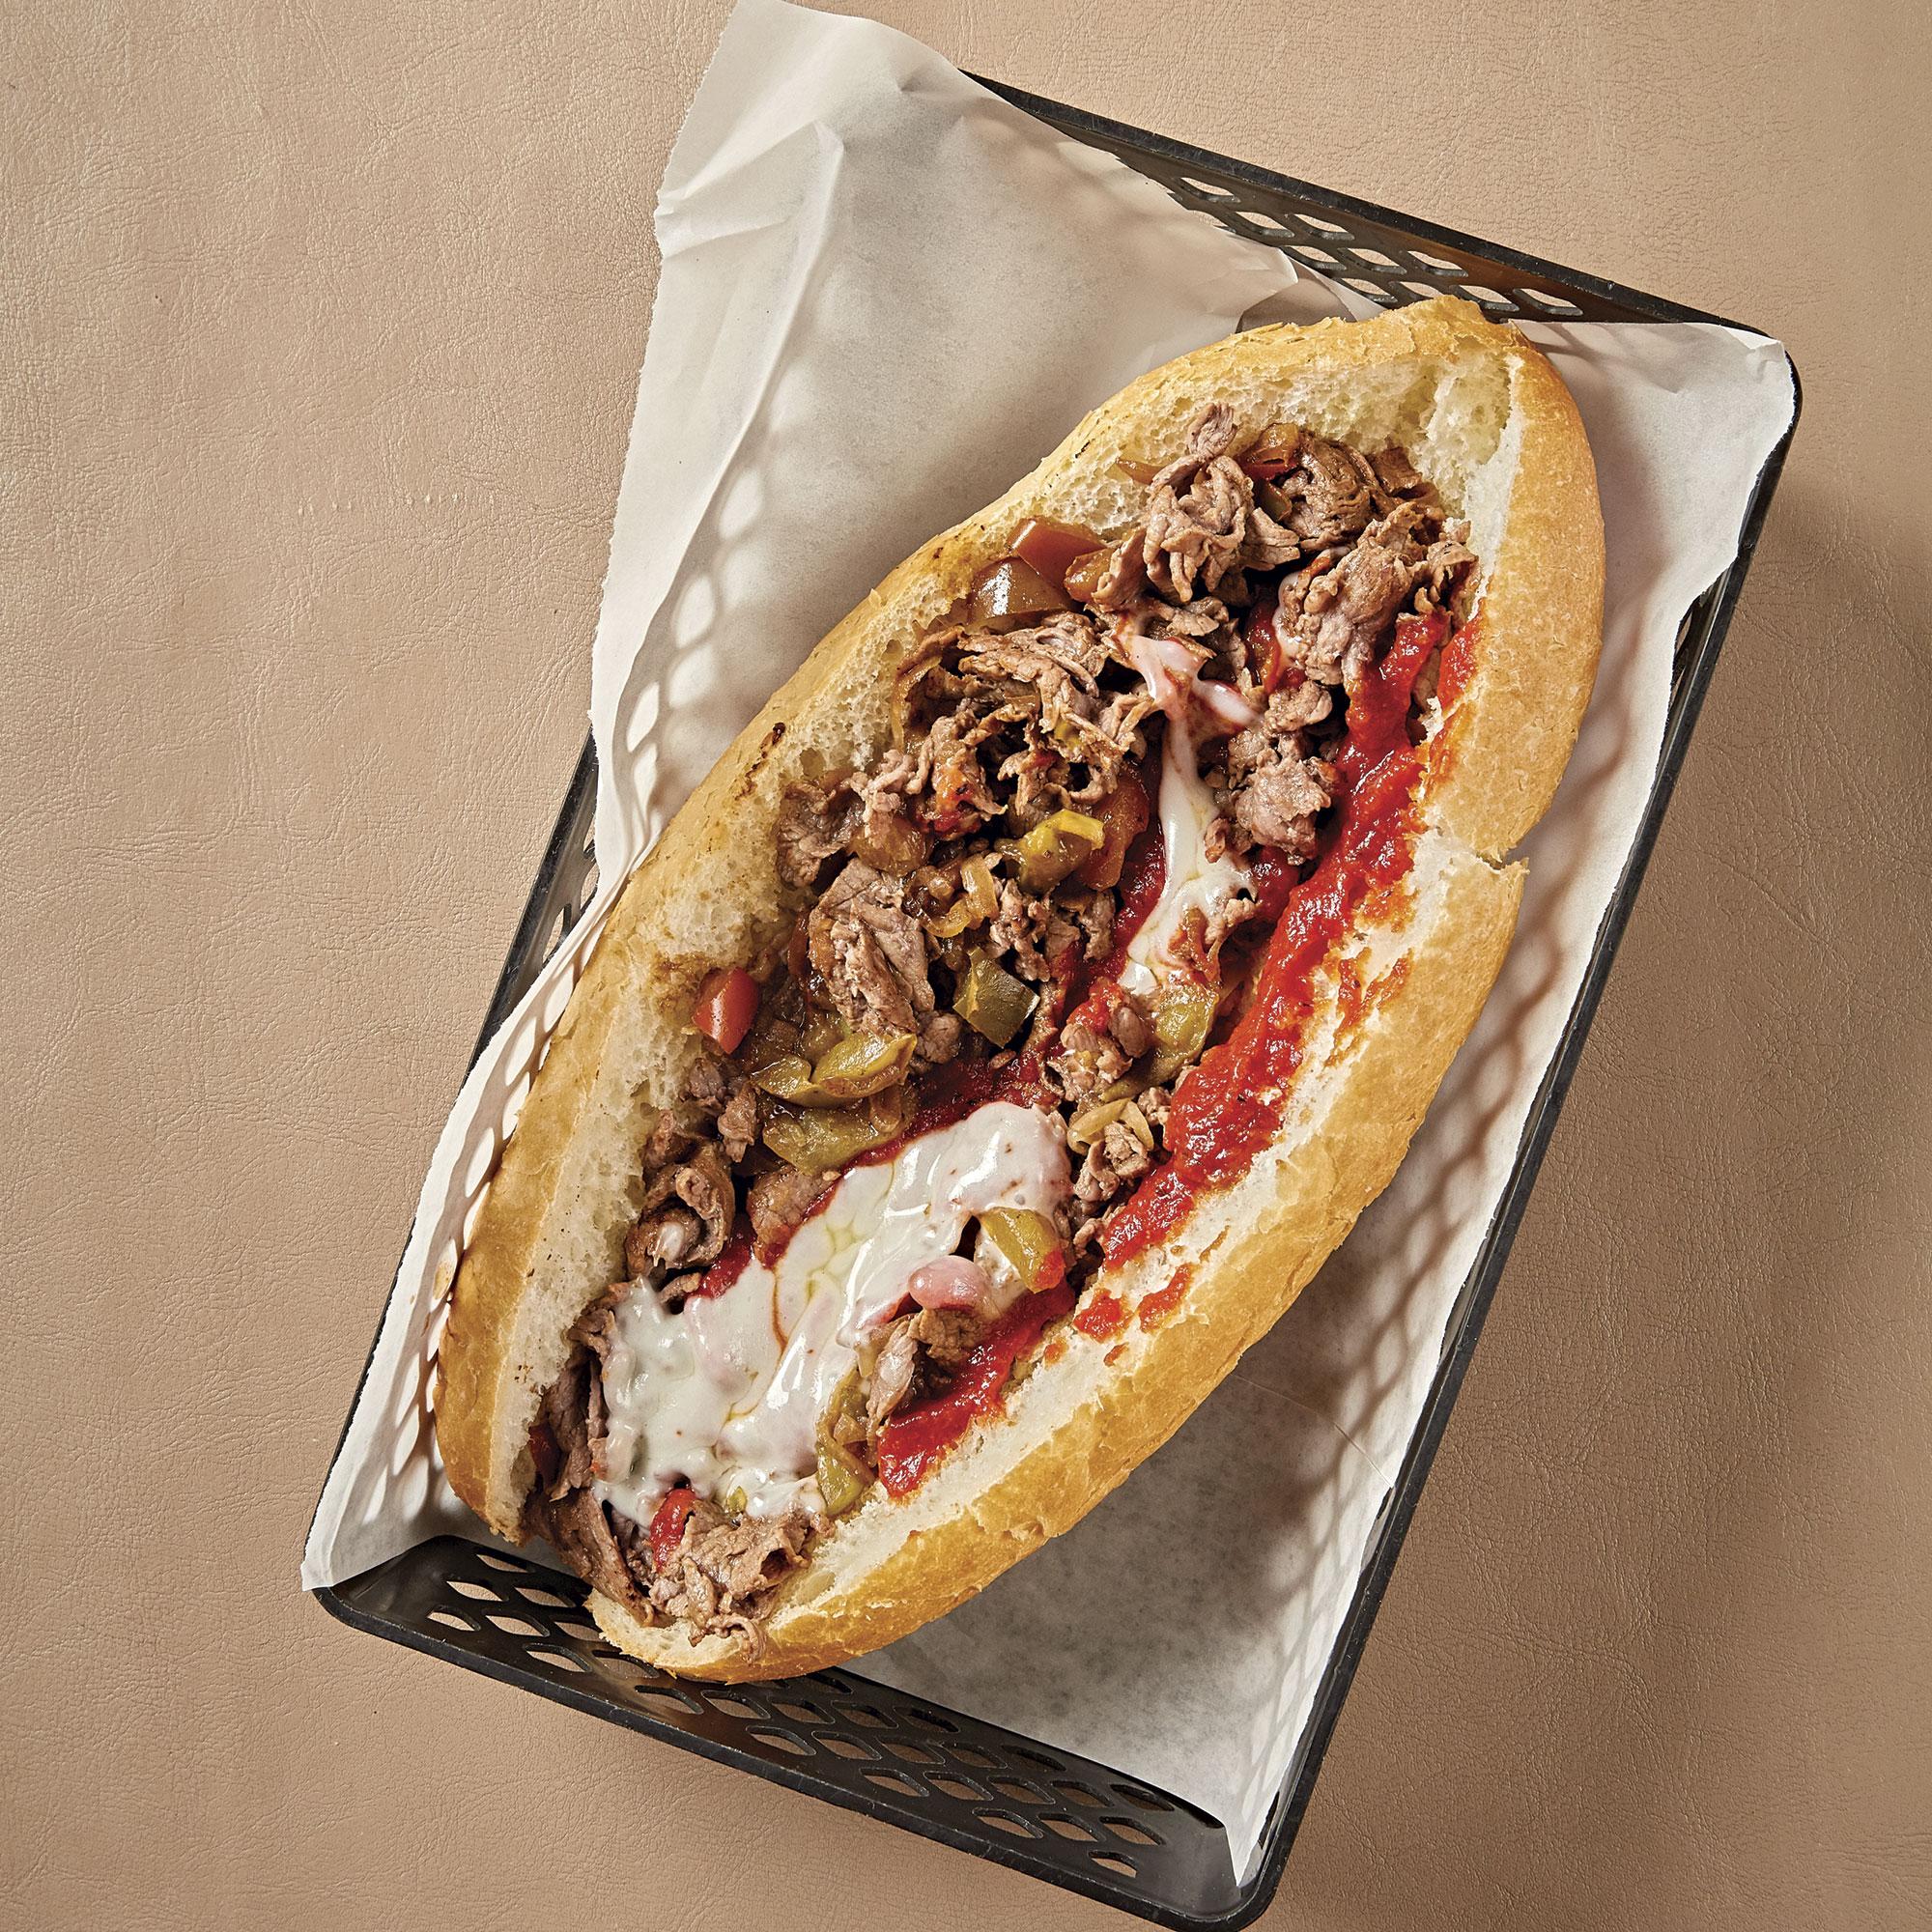 Philly cheesesteak at Casella's Italian Delicatessen; Photo by David B. Moore